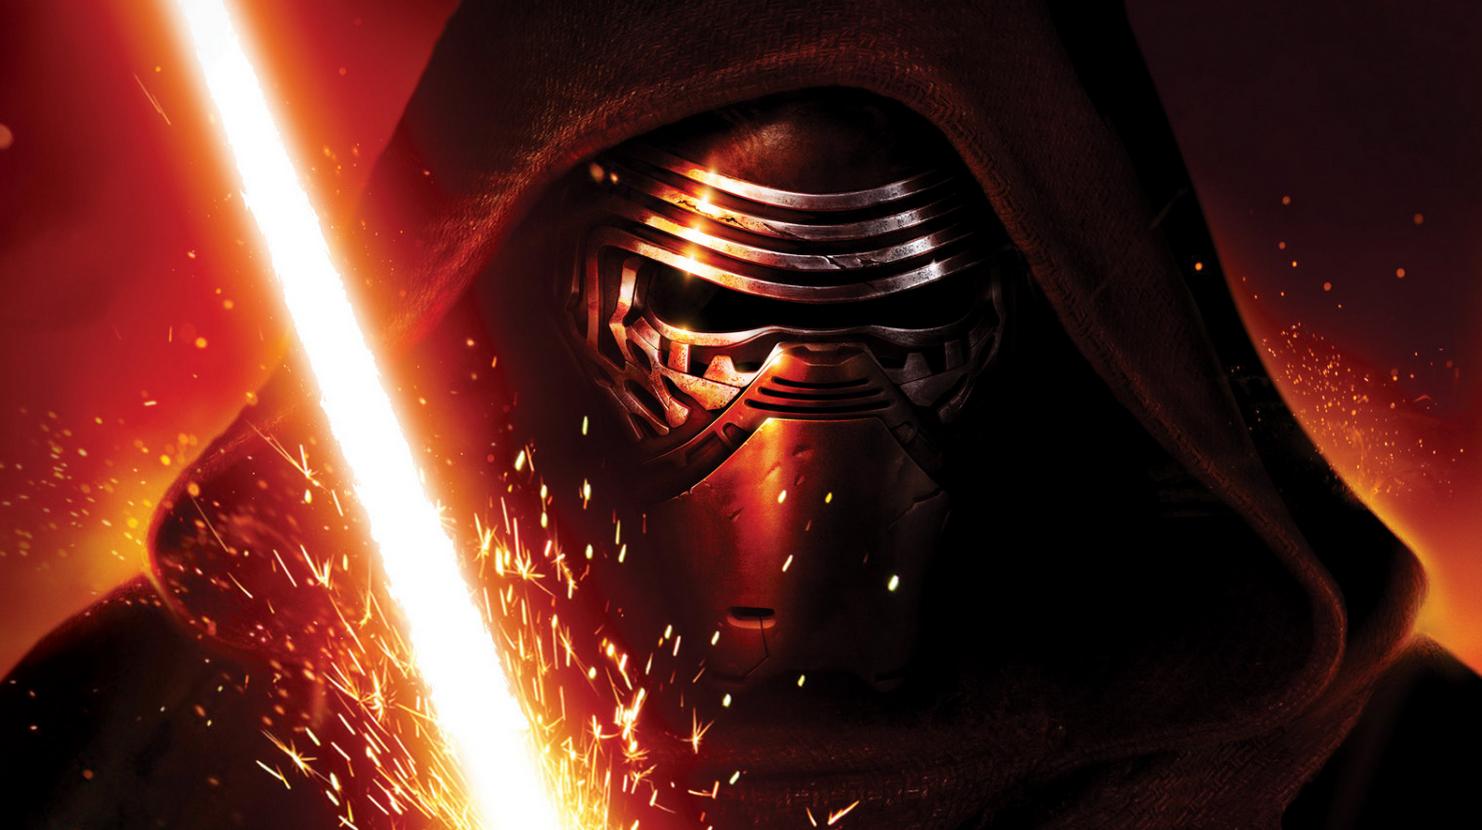 How Disney Revved Up the Star Wars Marketing Engine